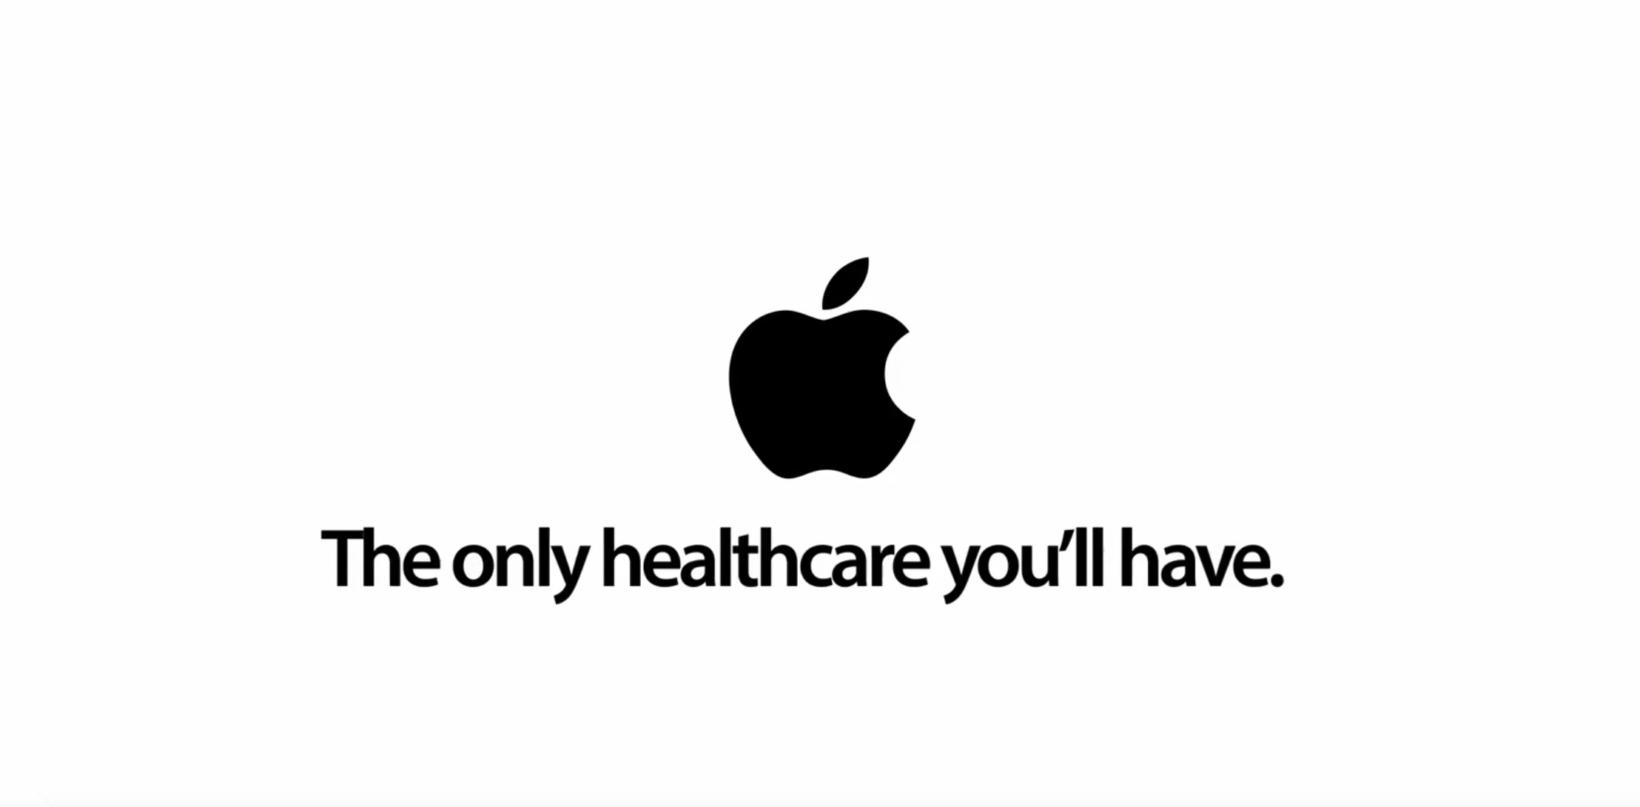 apple, healthcare, conan, conan o'brien